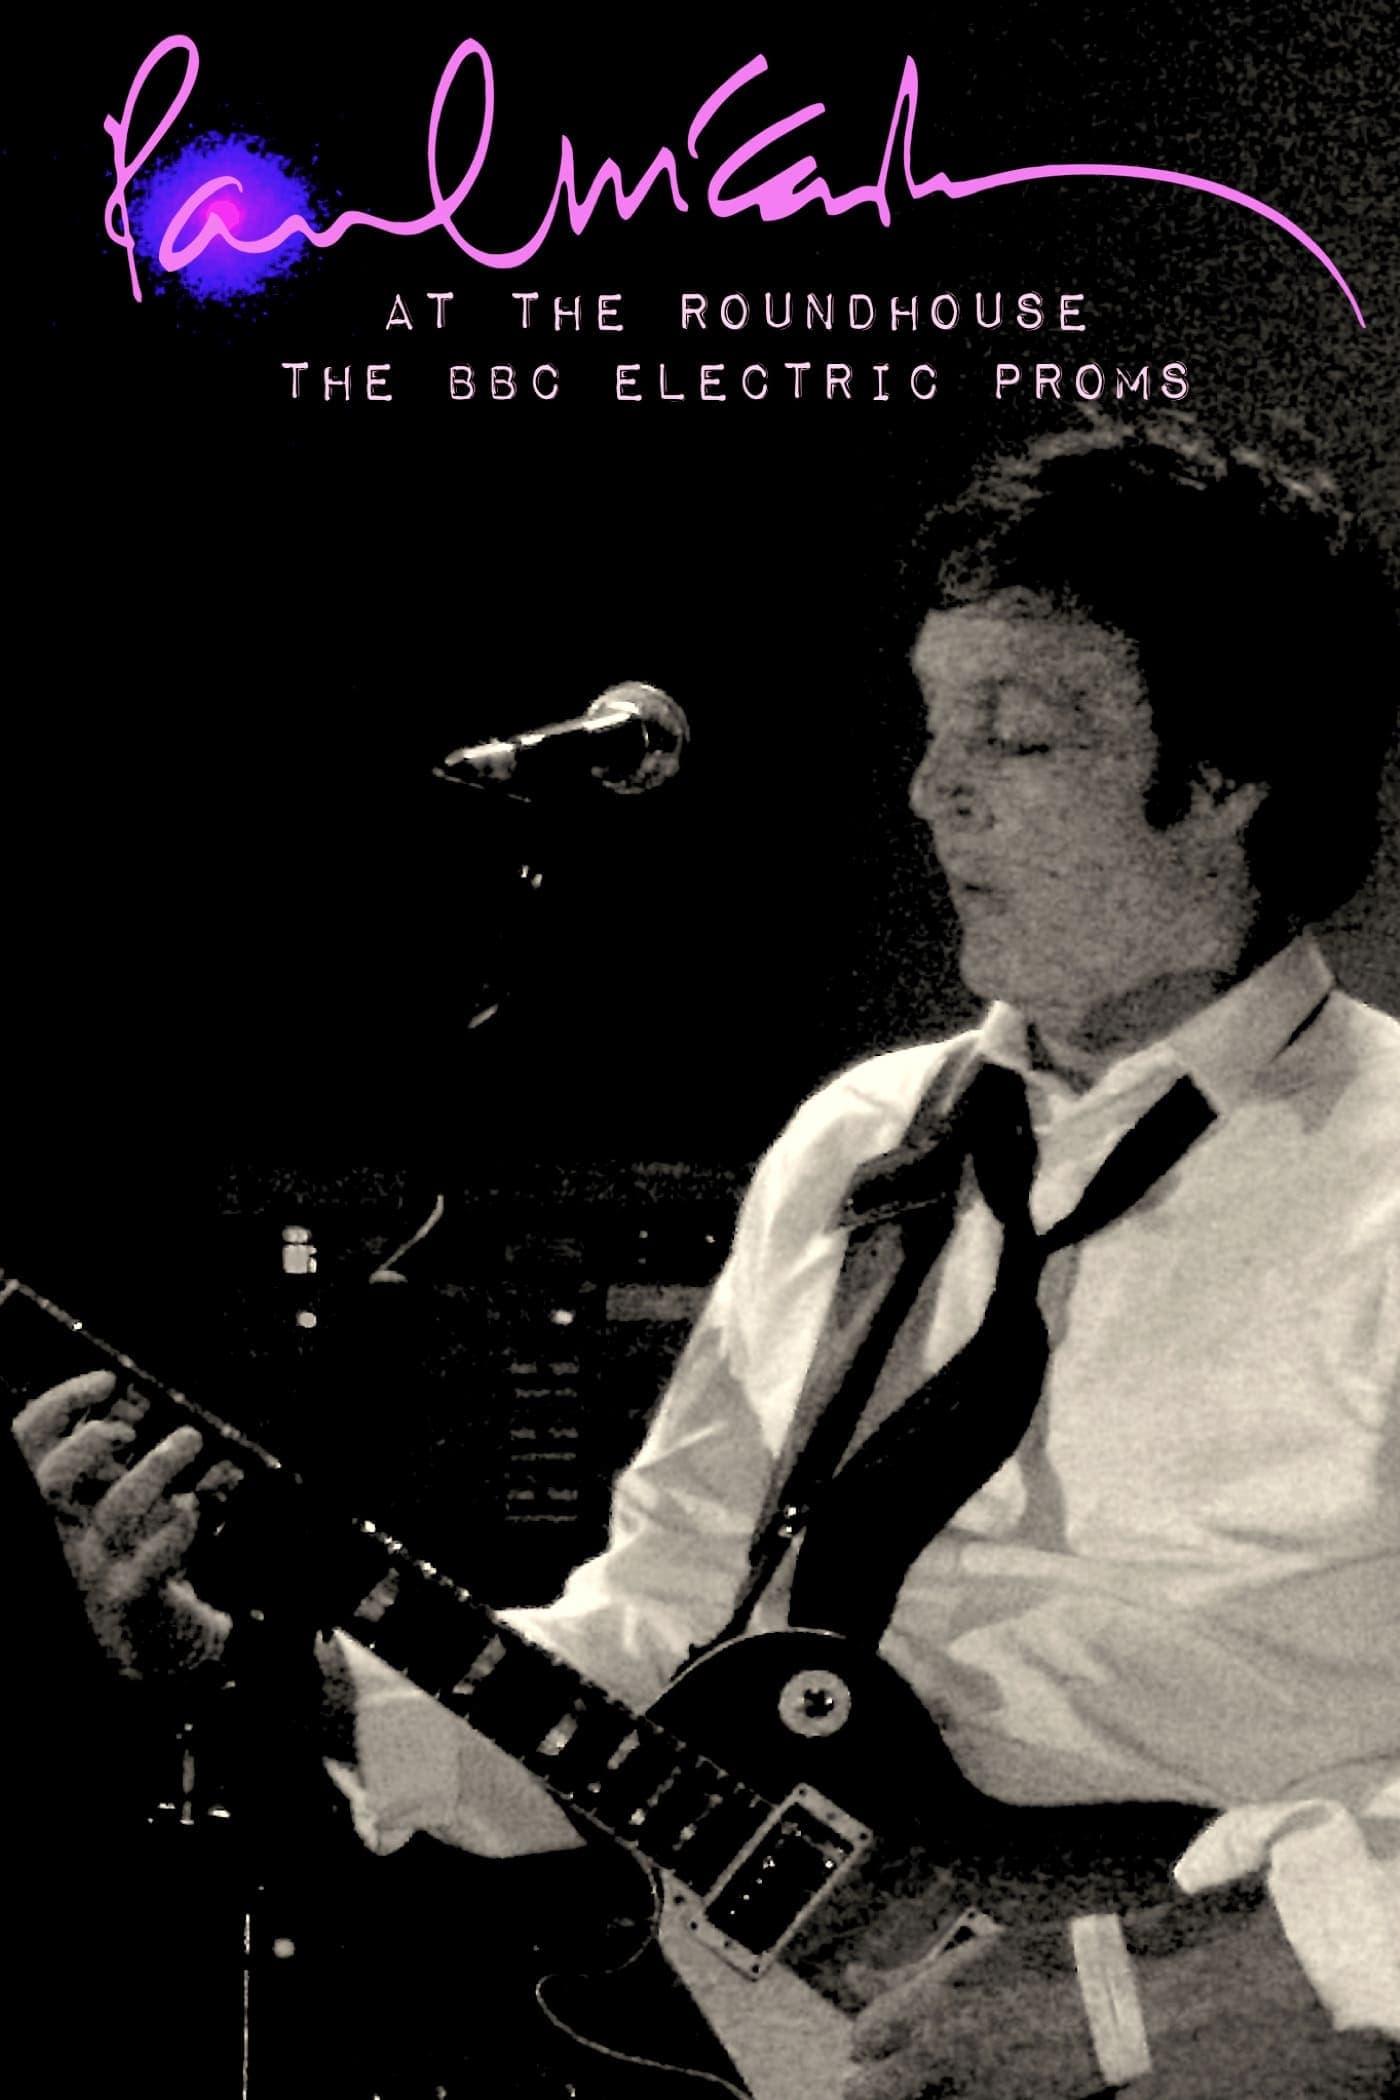 Paul McCartney: Live at BBC Electric Proms